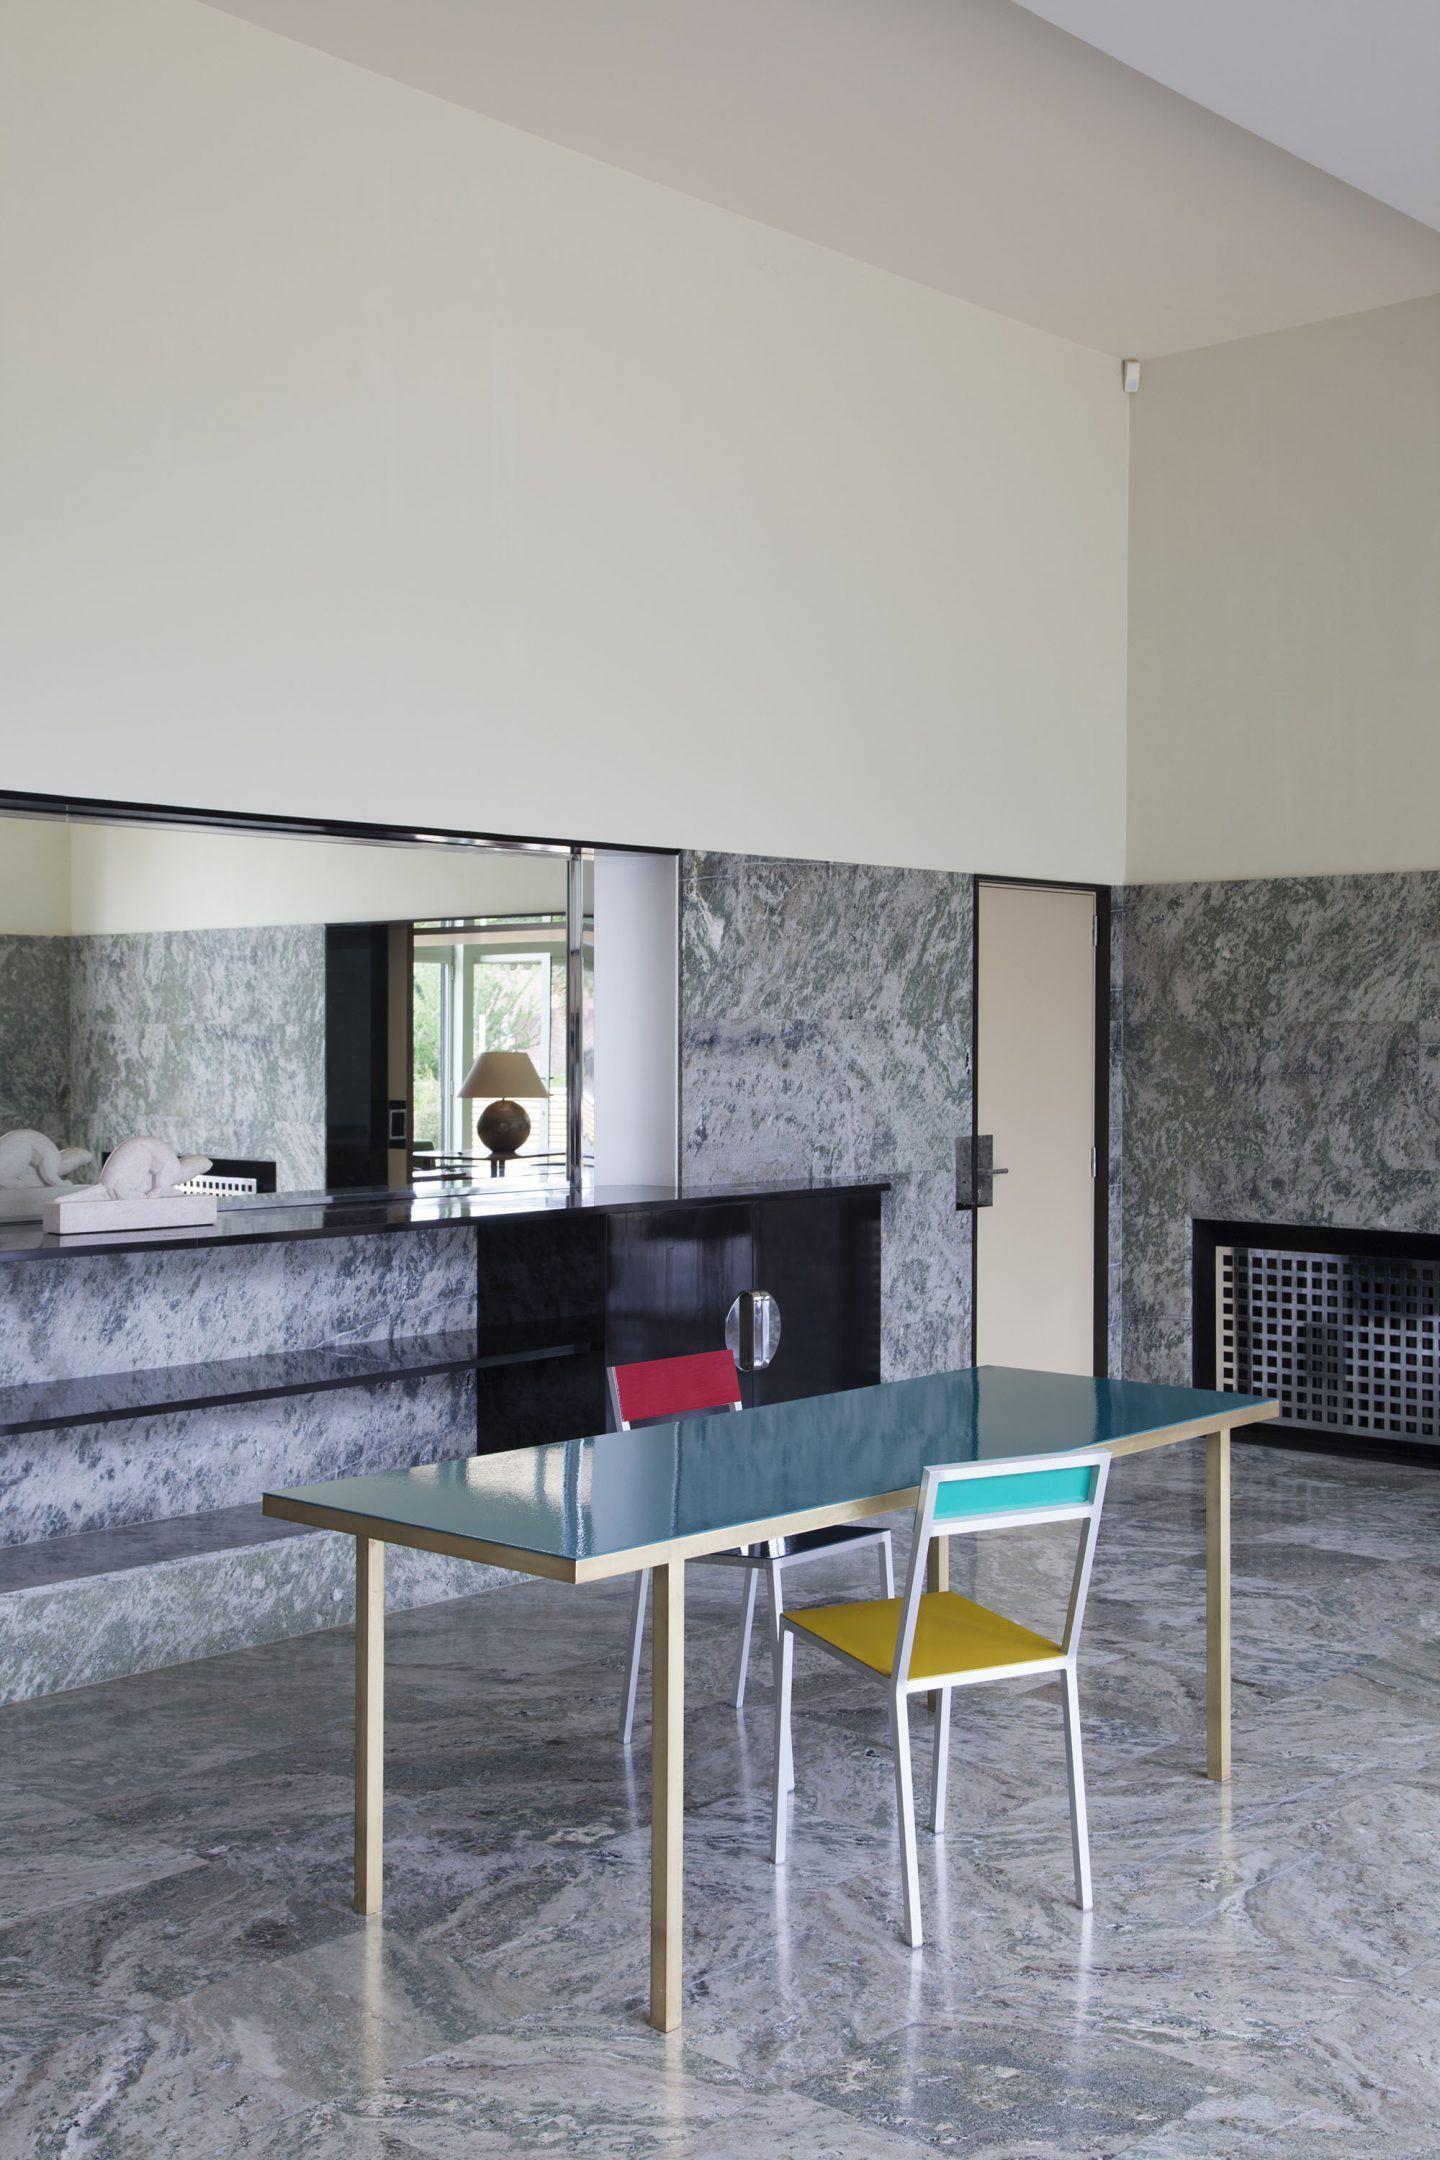 IGNANT-Design-Muller-Van-Severen-Villa-Cavrois-03